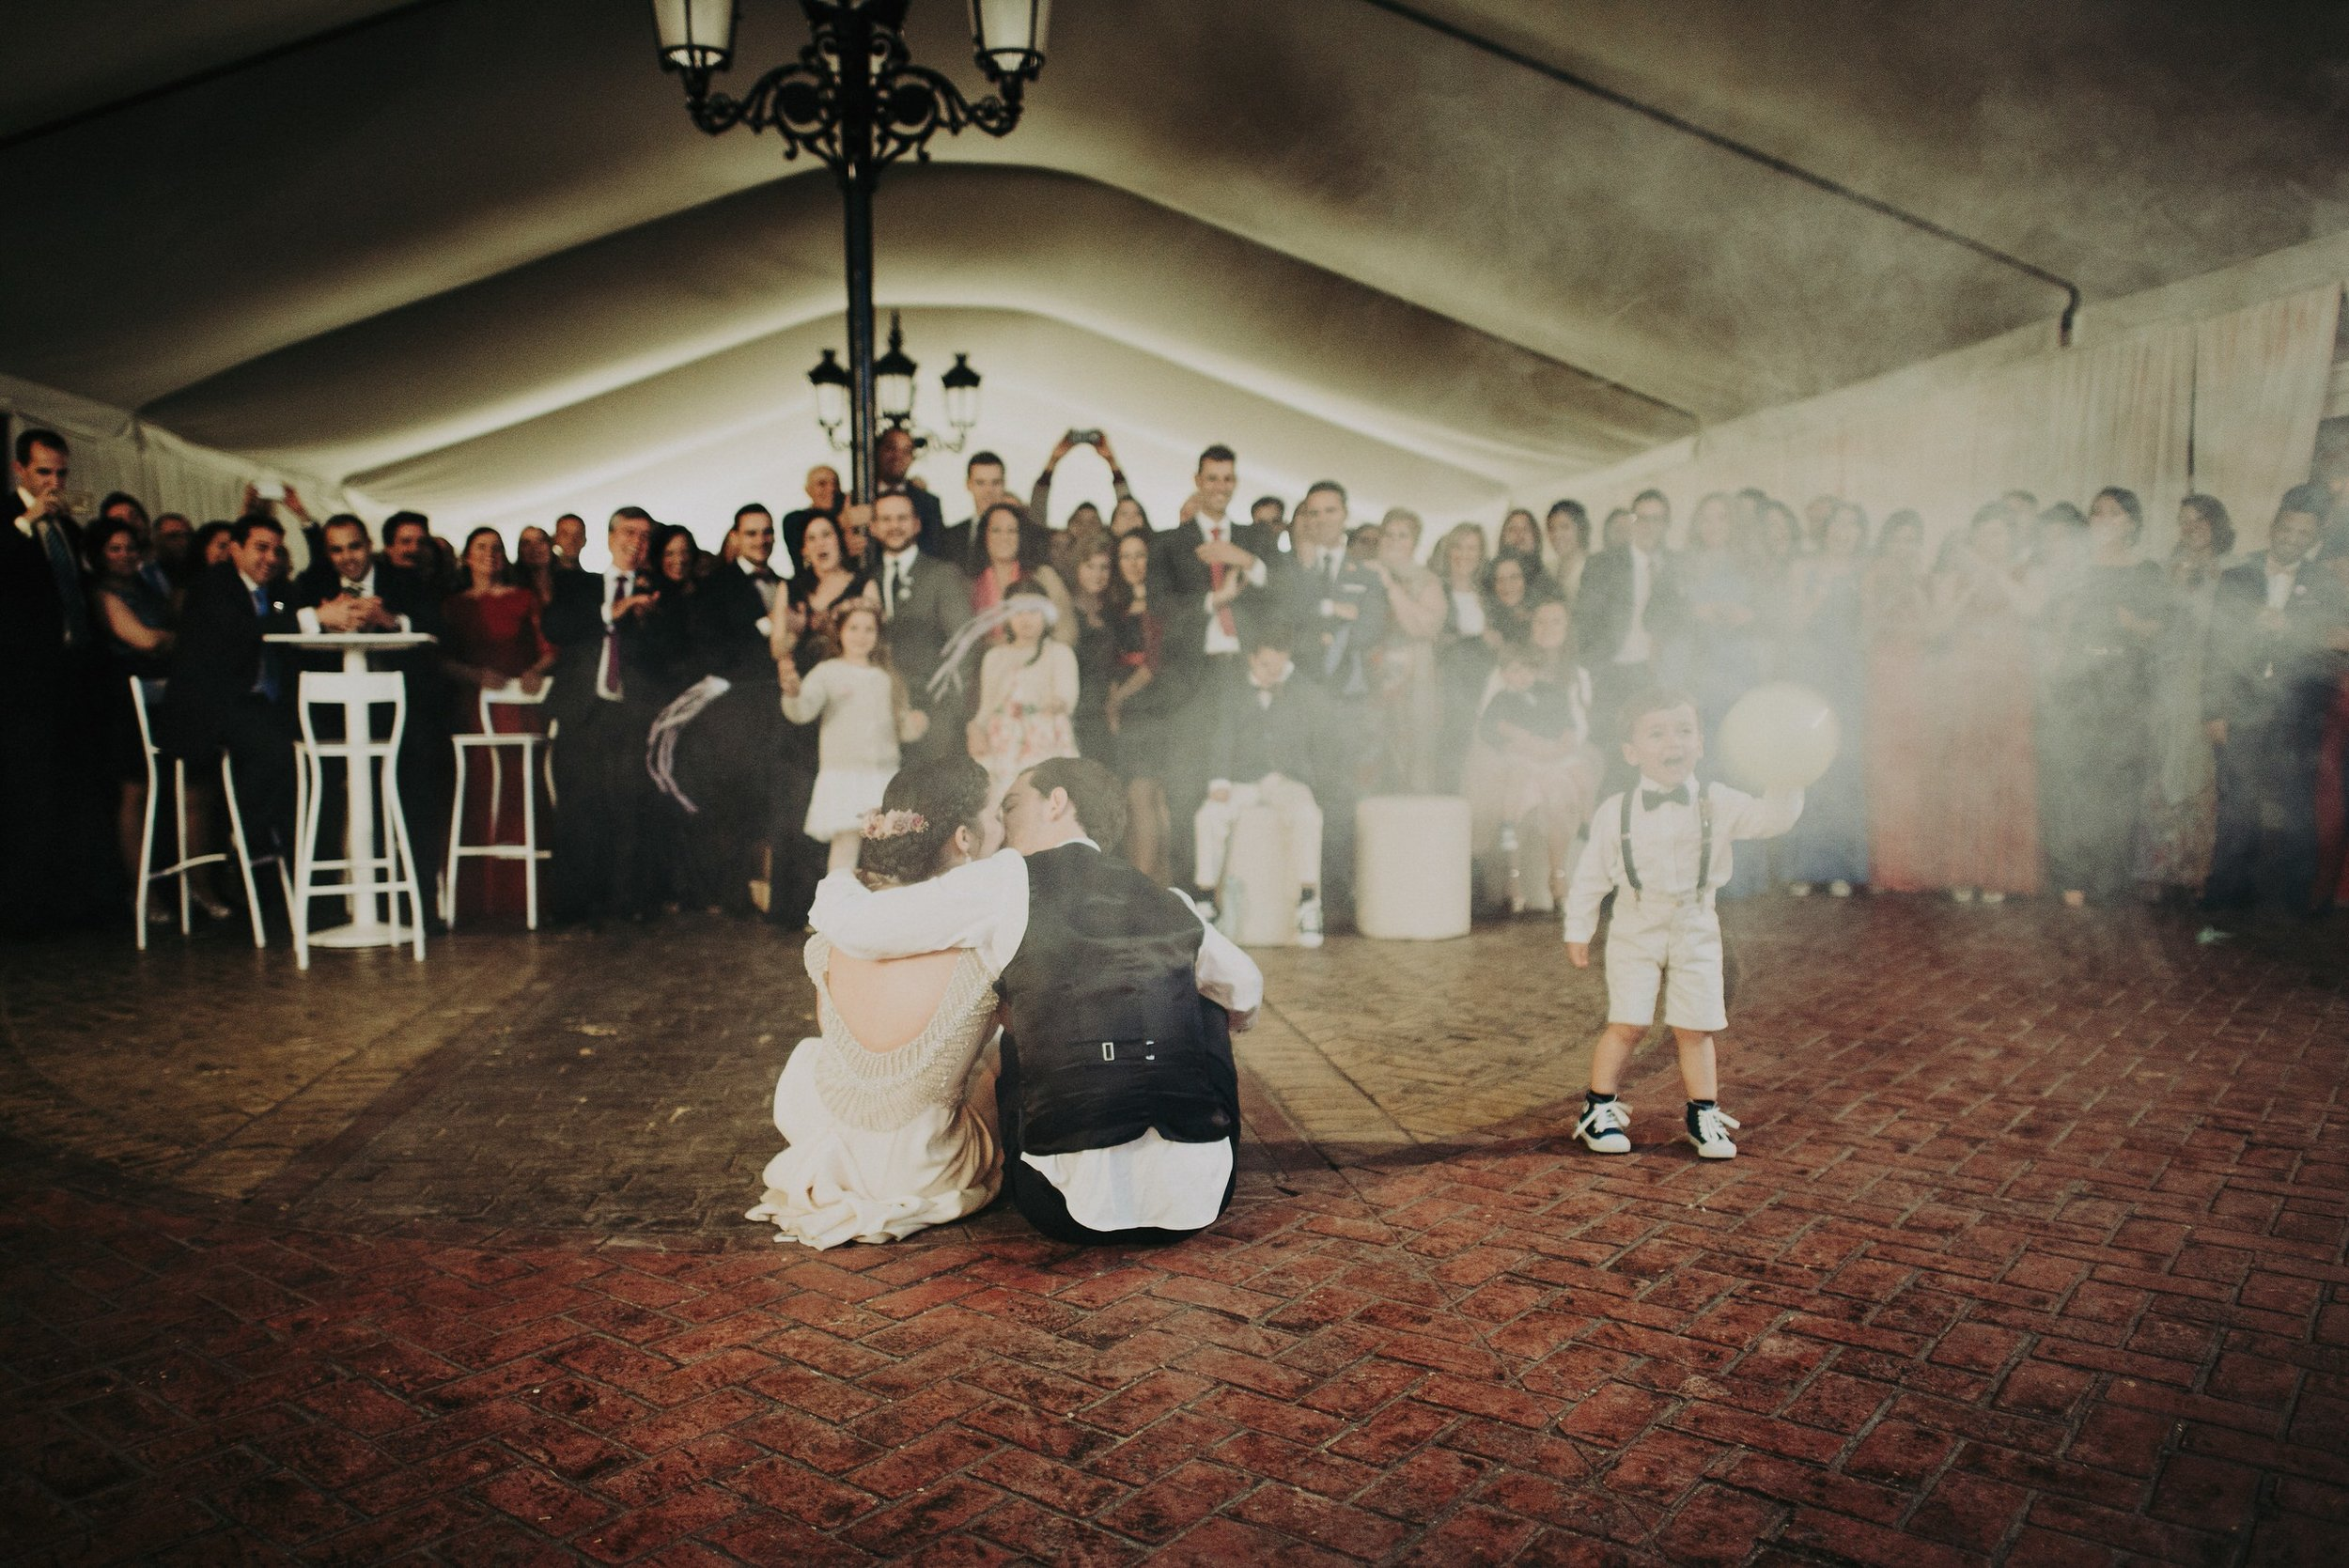 Laura & Rubén - boda en utrera - Santa clotilde- Manolo mayo - Fotografo de boda - Andrés Amarillo AAA_1075-Exposure (43).jpg